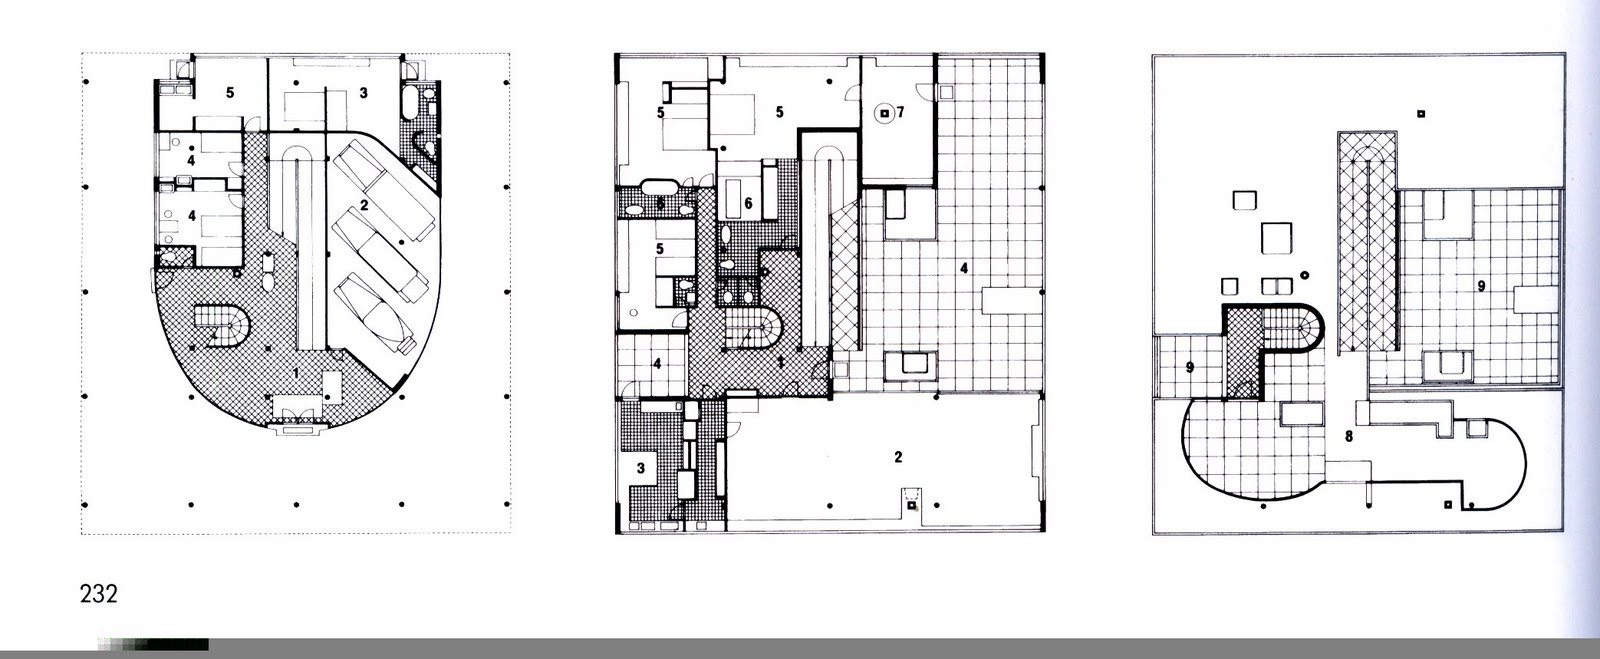 B2 Plan Villa Savoye Jpg 1600 215 659 Plans Pinterest